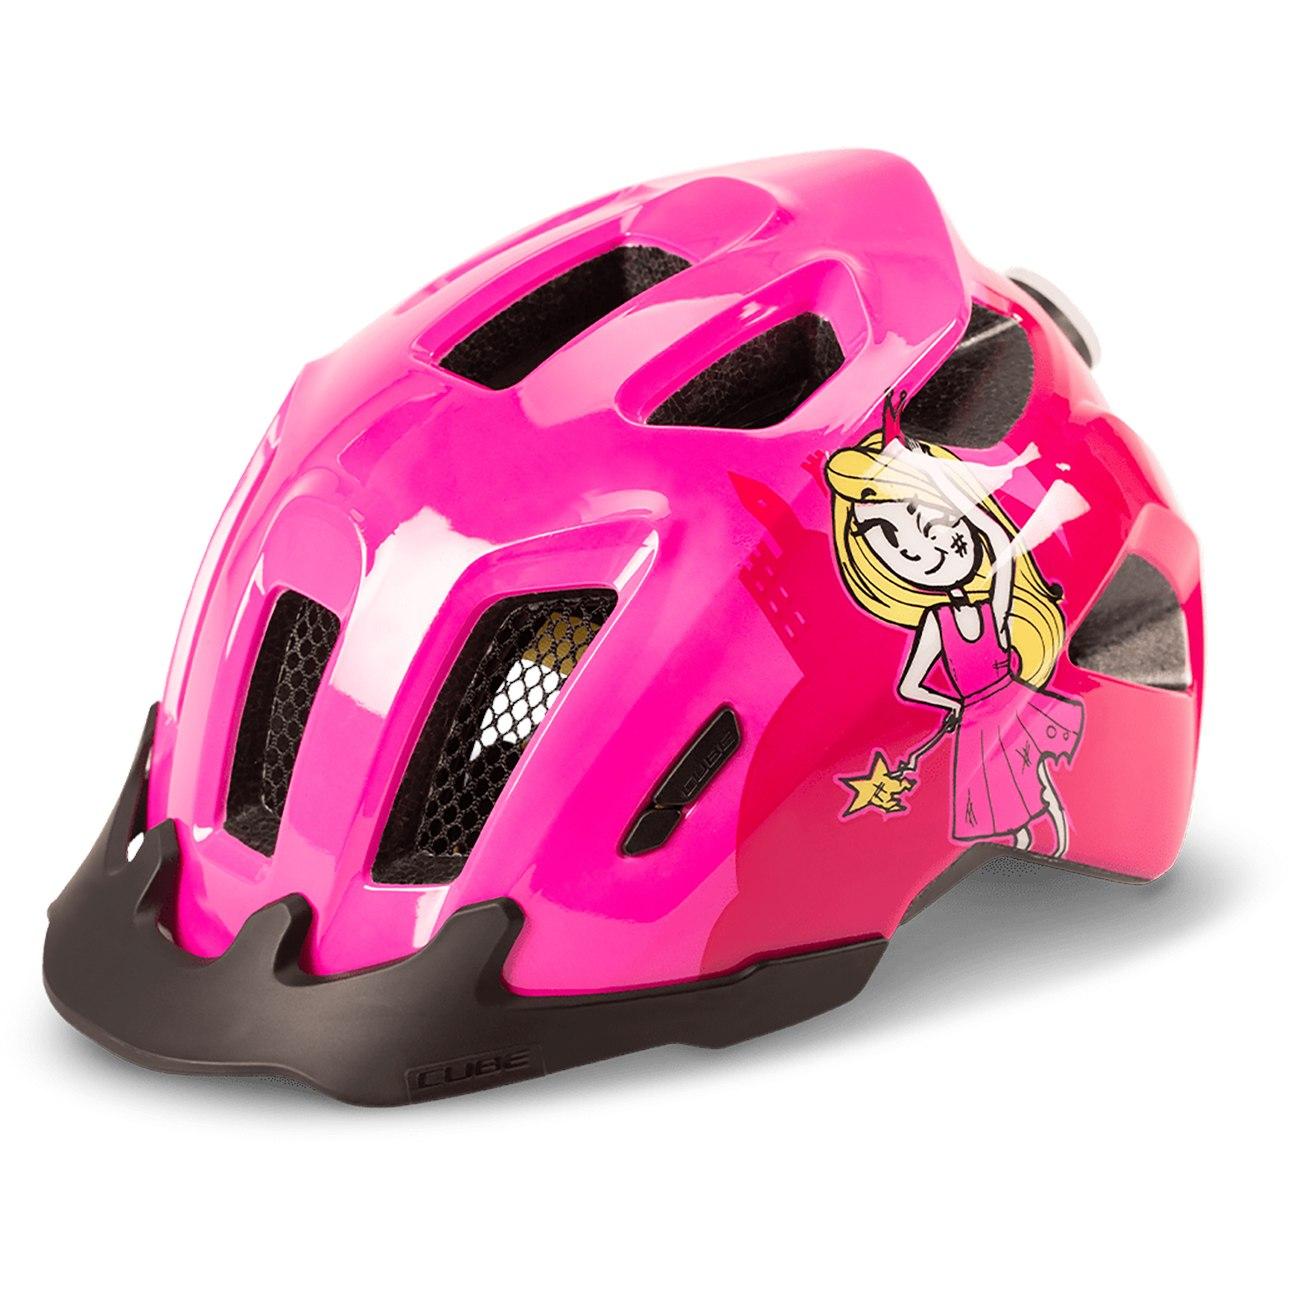 CUBE Helmet ANT - pink